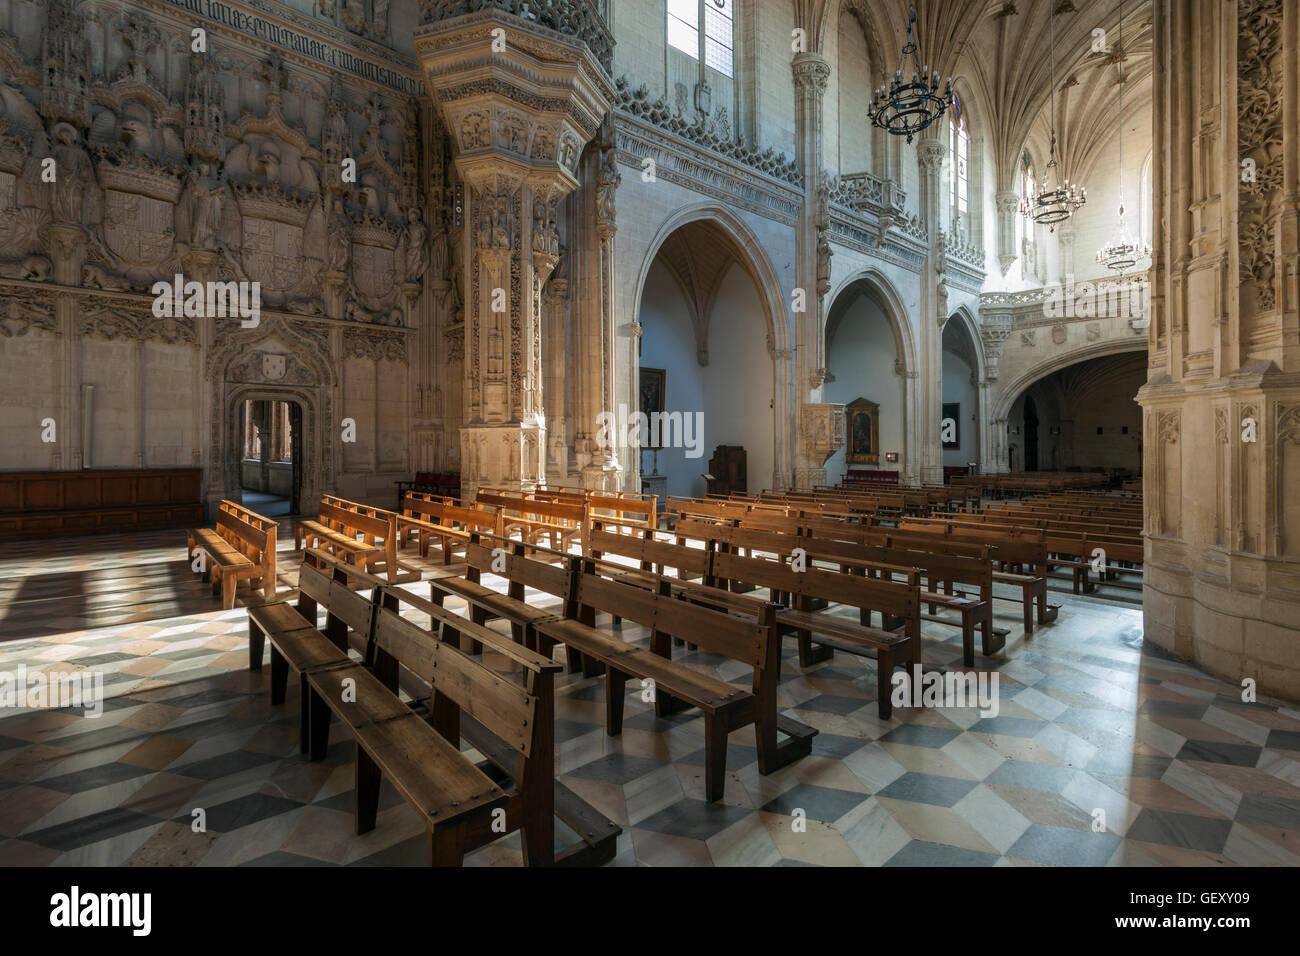 Church interior in monastery of Saint John of the Kings. - Stock Image